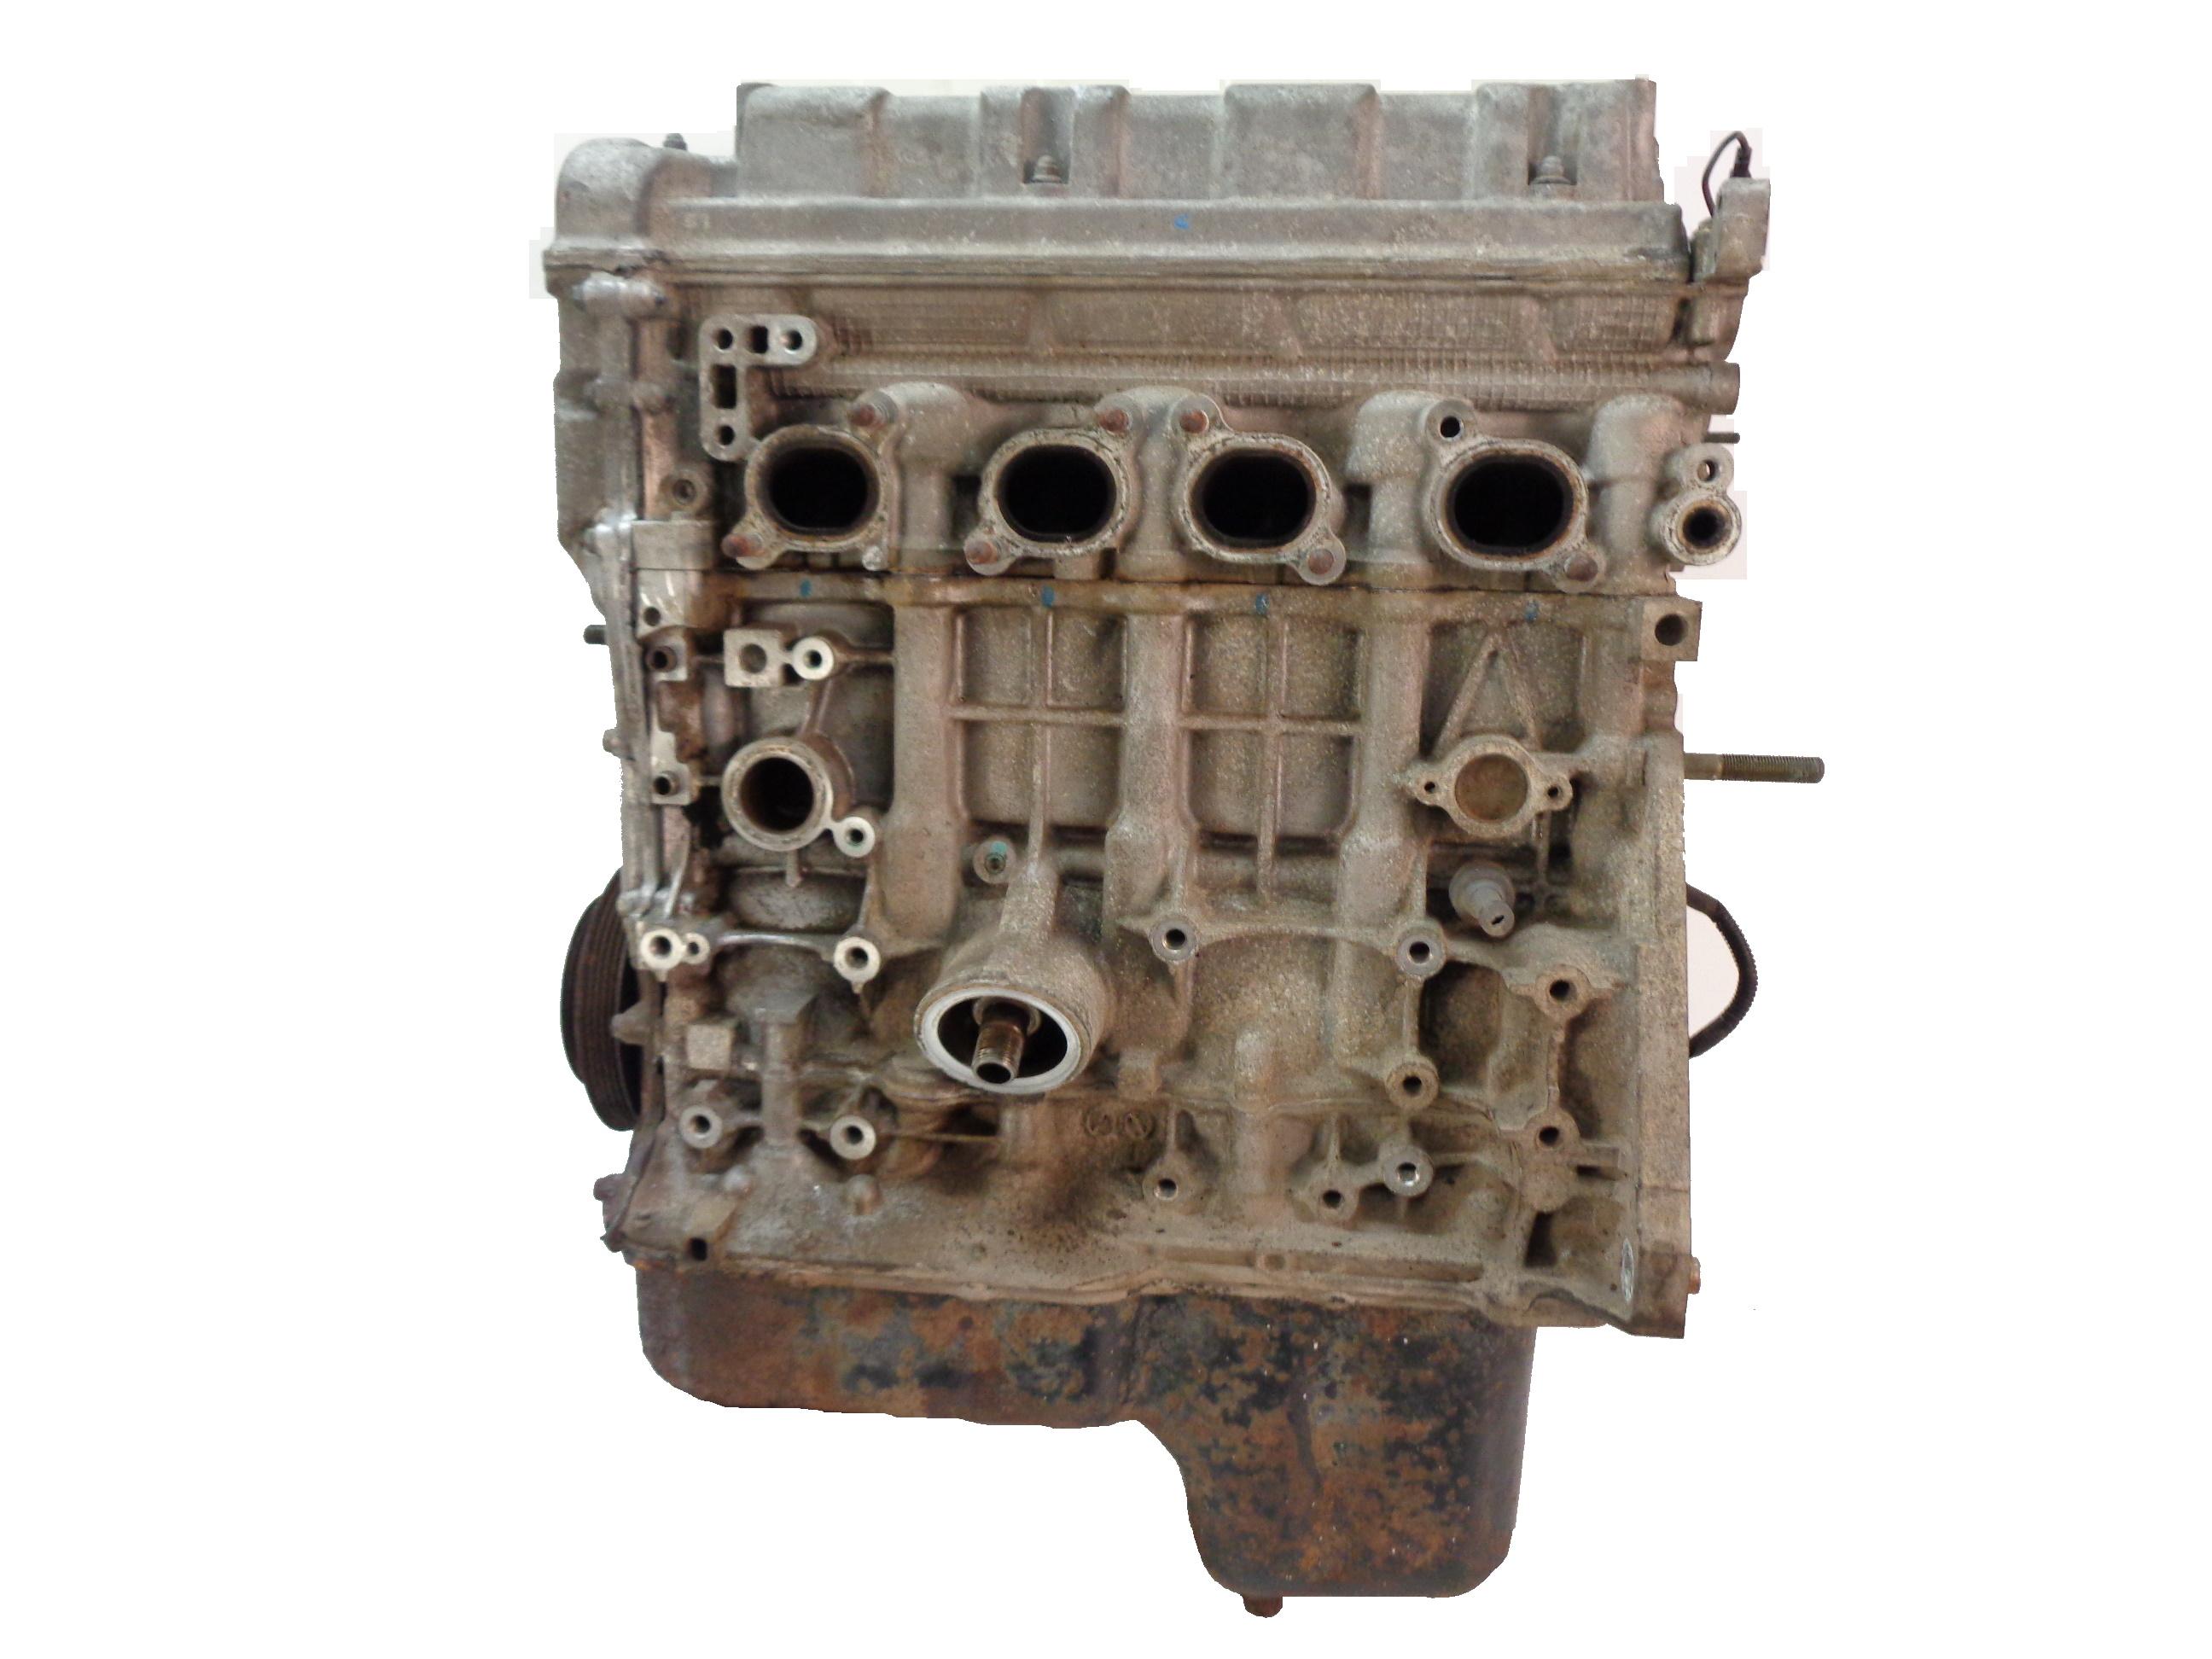 Motor 2005 Suzuki Grand Vitara II 2,0 16V Allrad J20A 140 PS